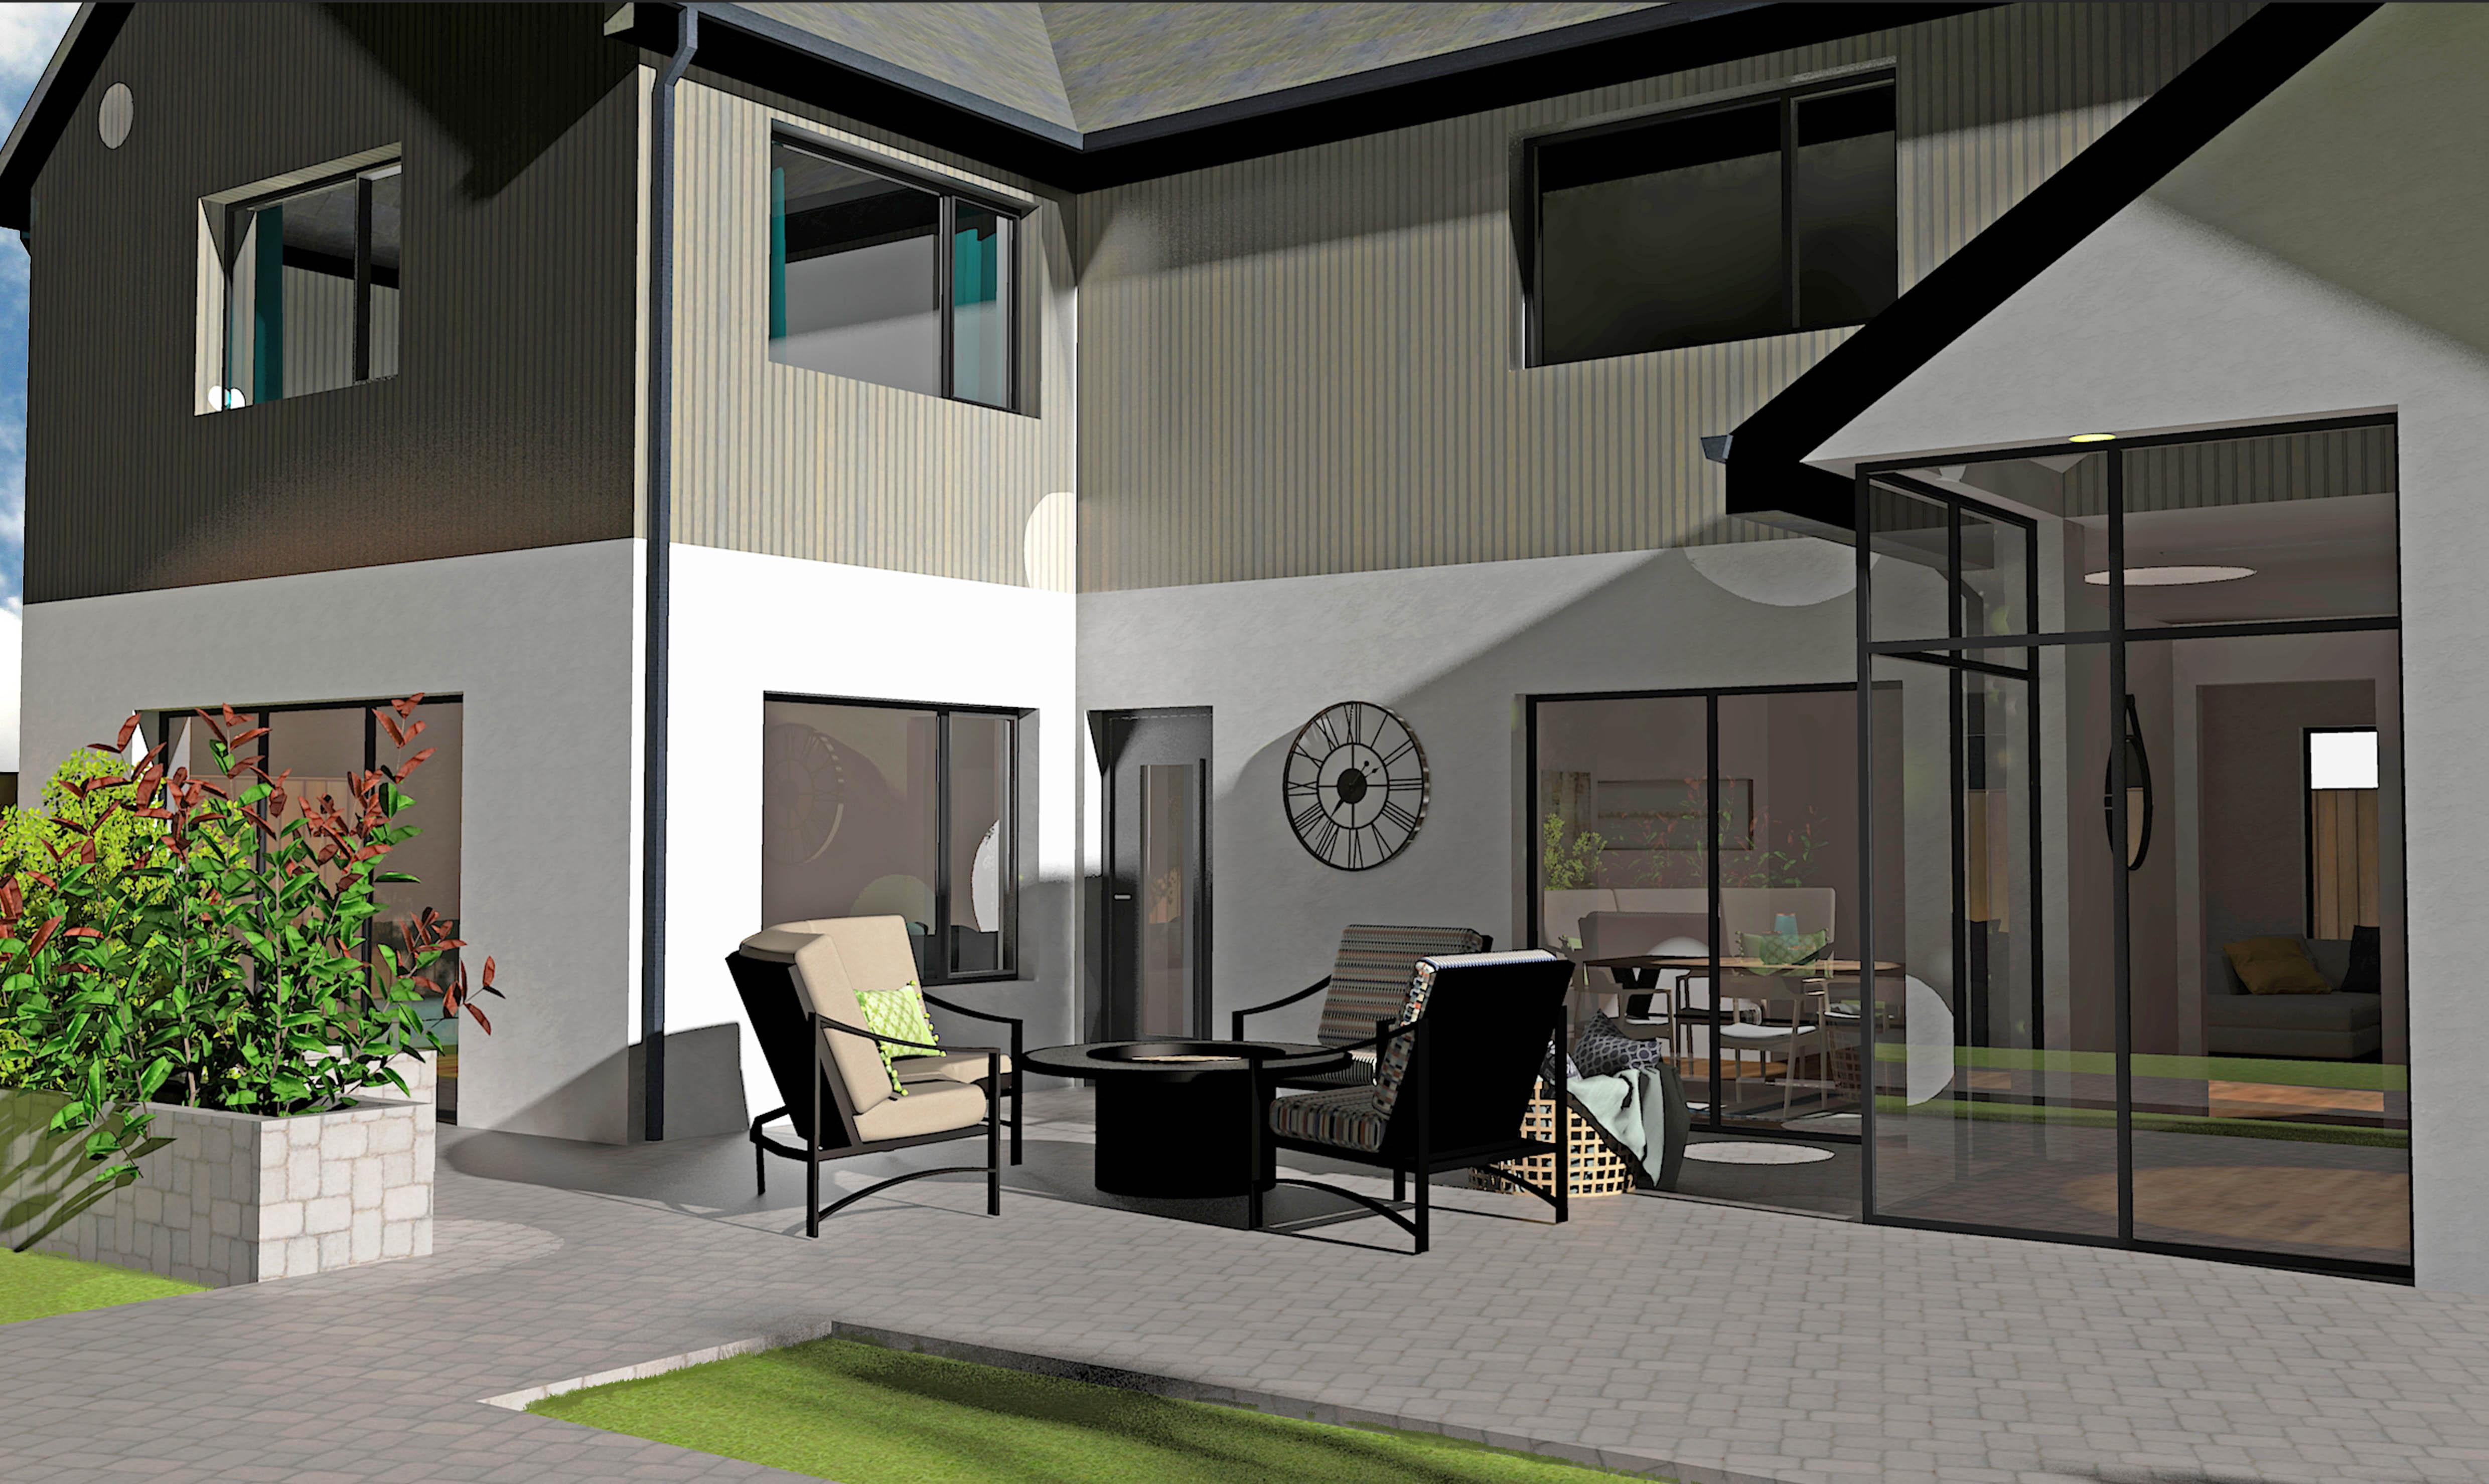 Whyteleafe Architects